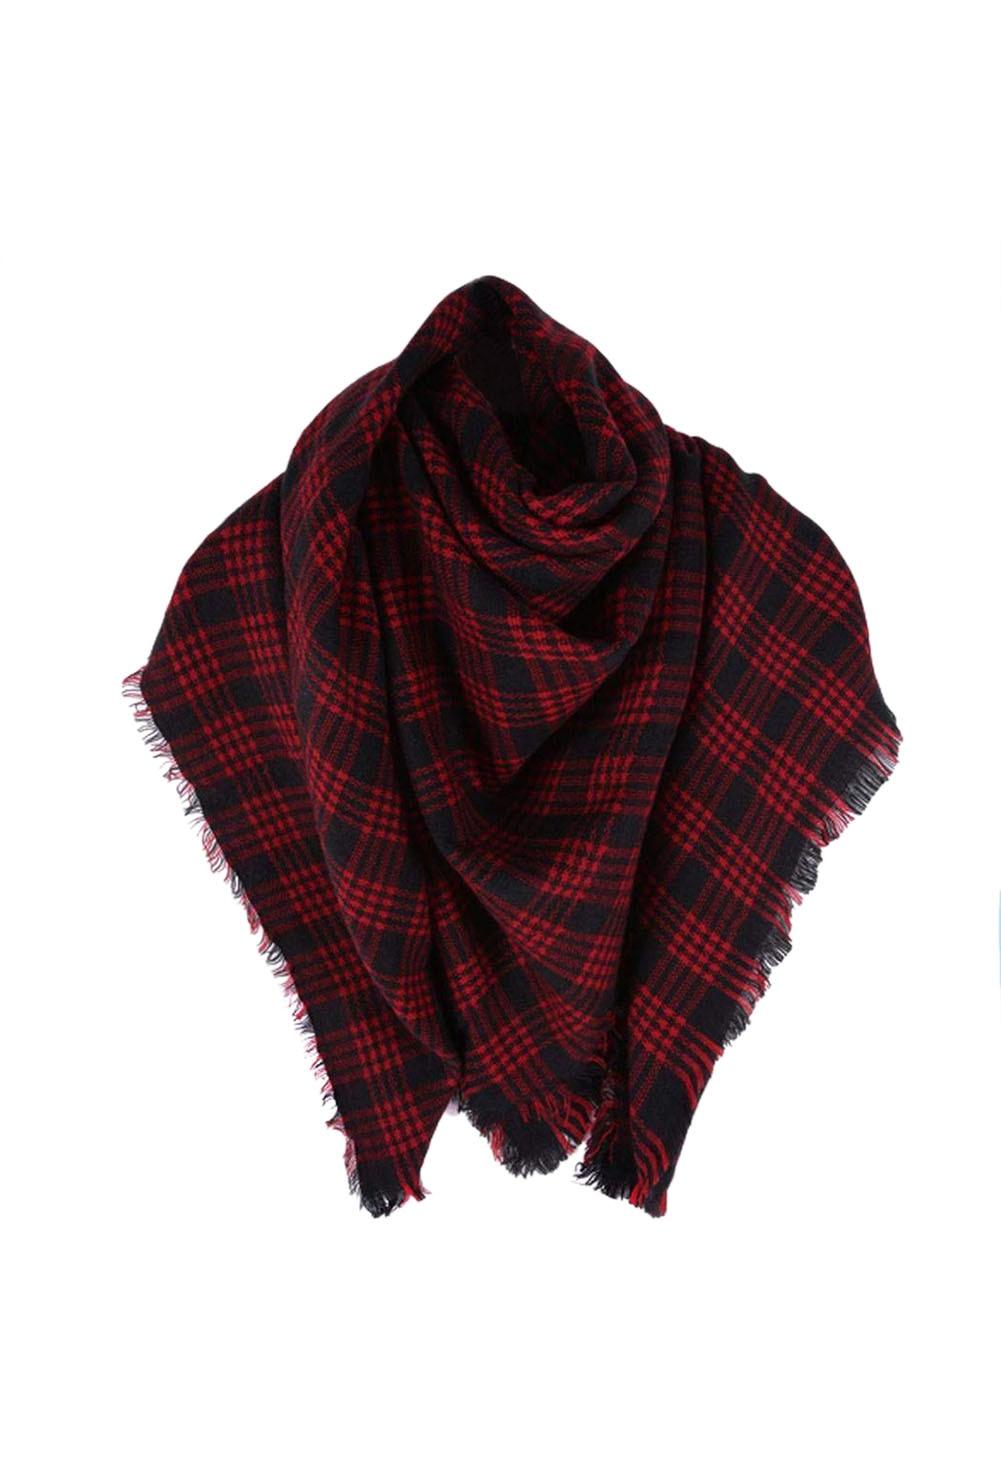 SAF-Wool Blend Tartan Plaid Soft   Scarf     Wrap   Shawl Blanket Stole Pashmina Red+Black